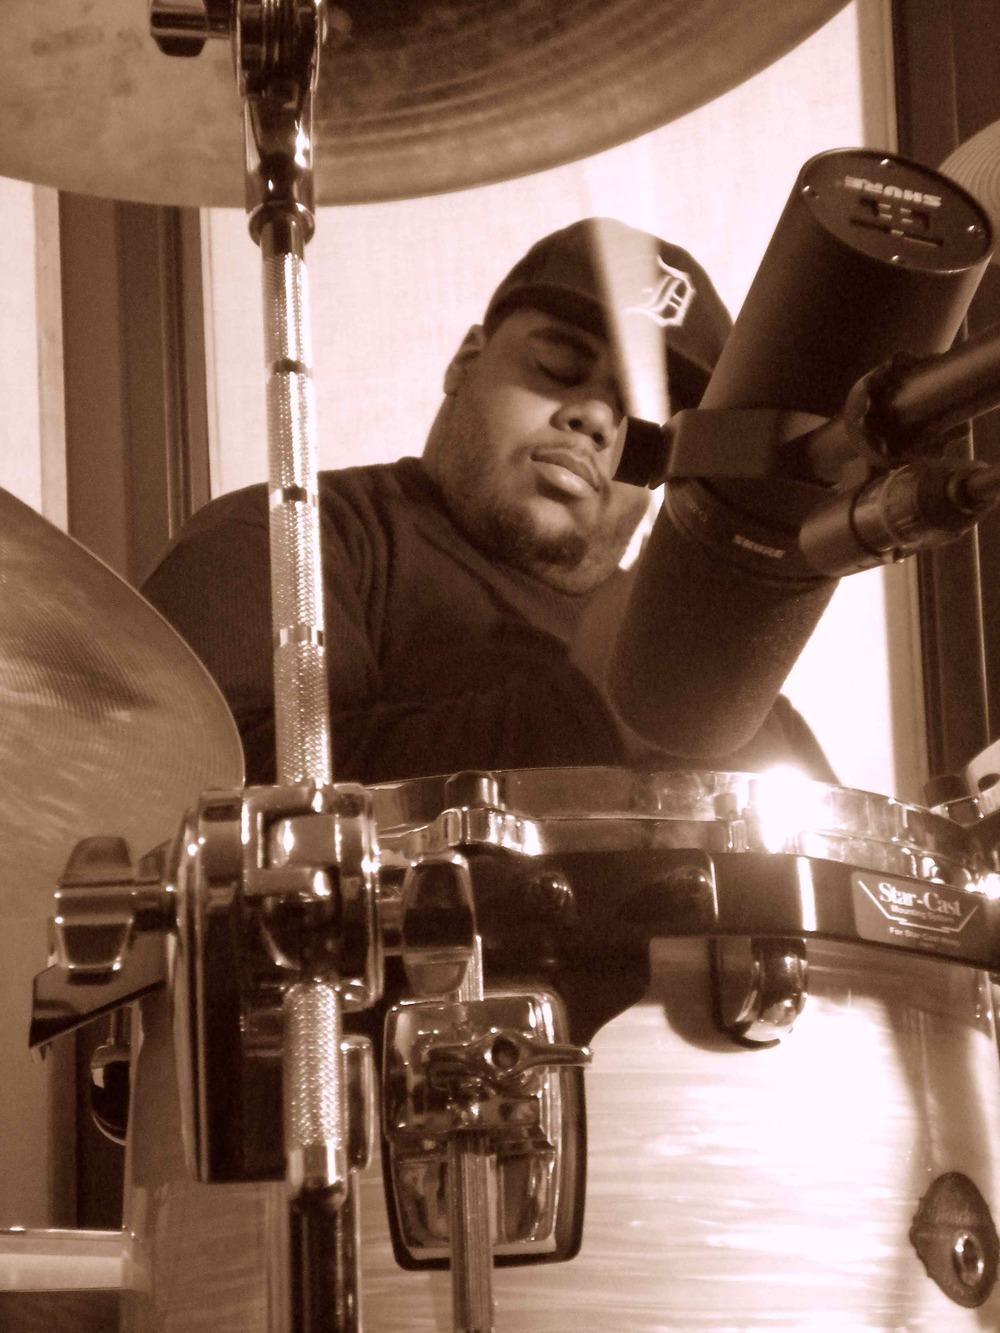 Kris Brooks at Tanona Studios - Through Kit3 - Sepia.jpg